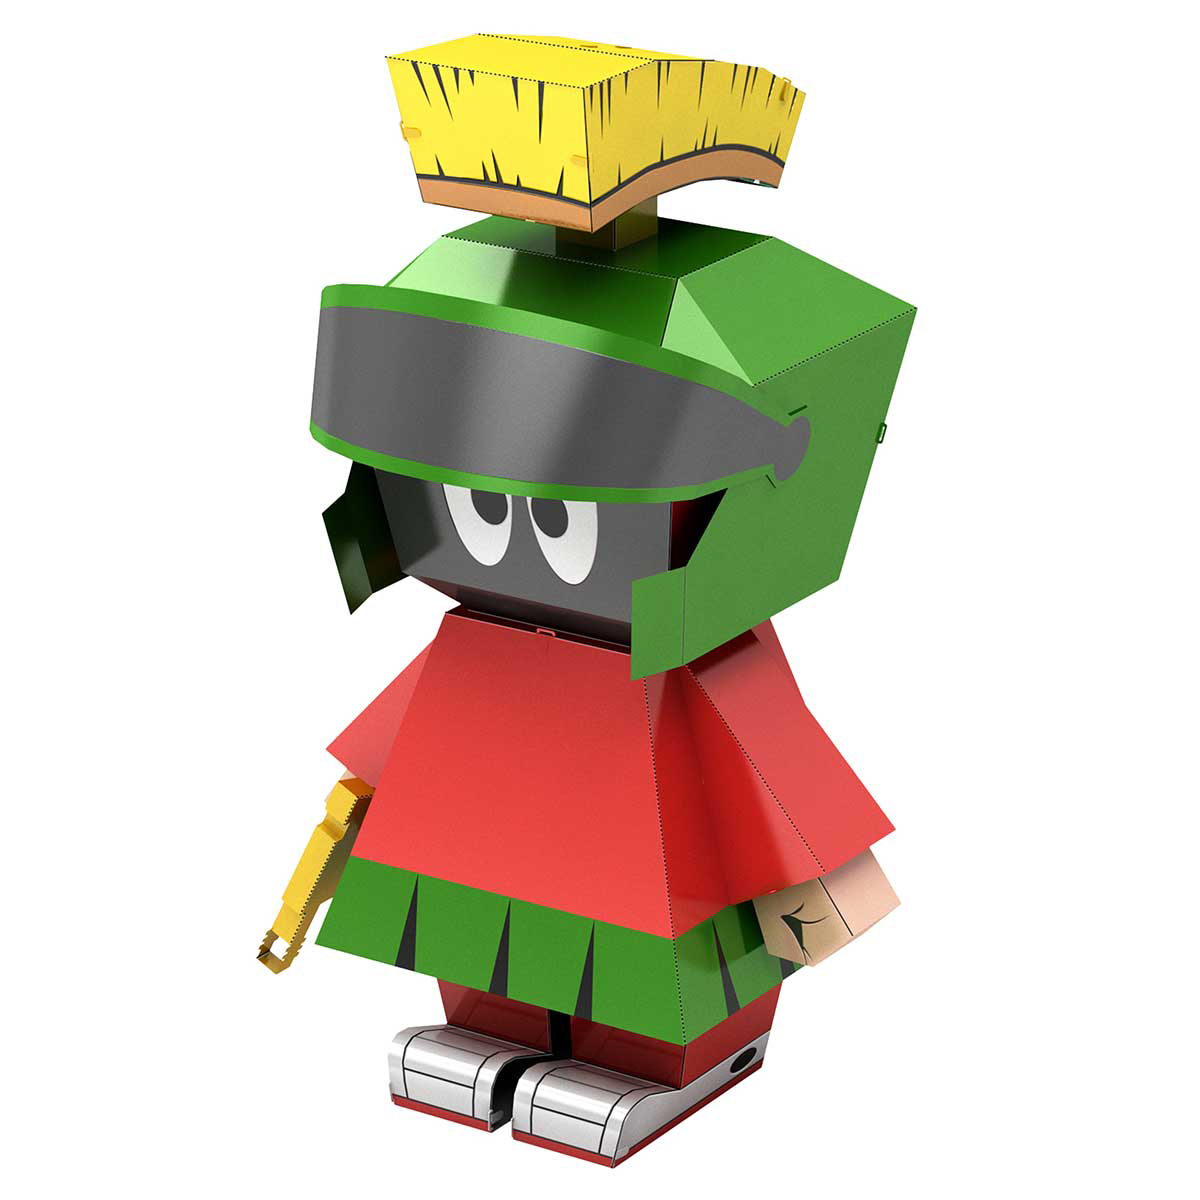 Marvin the Martian Cartoons 3D Puzzle